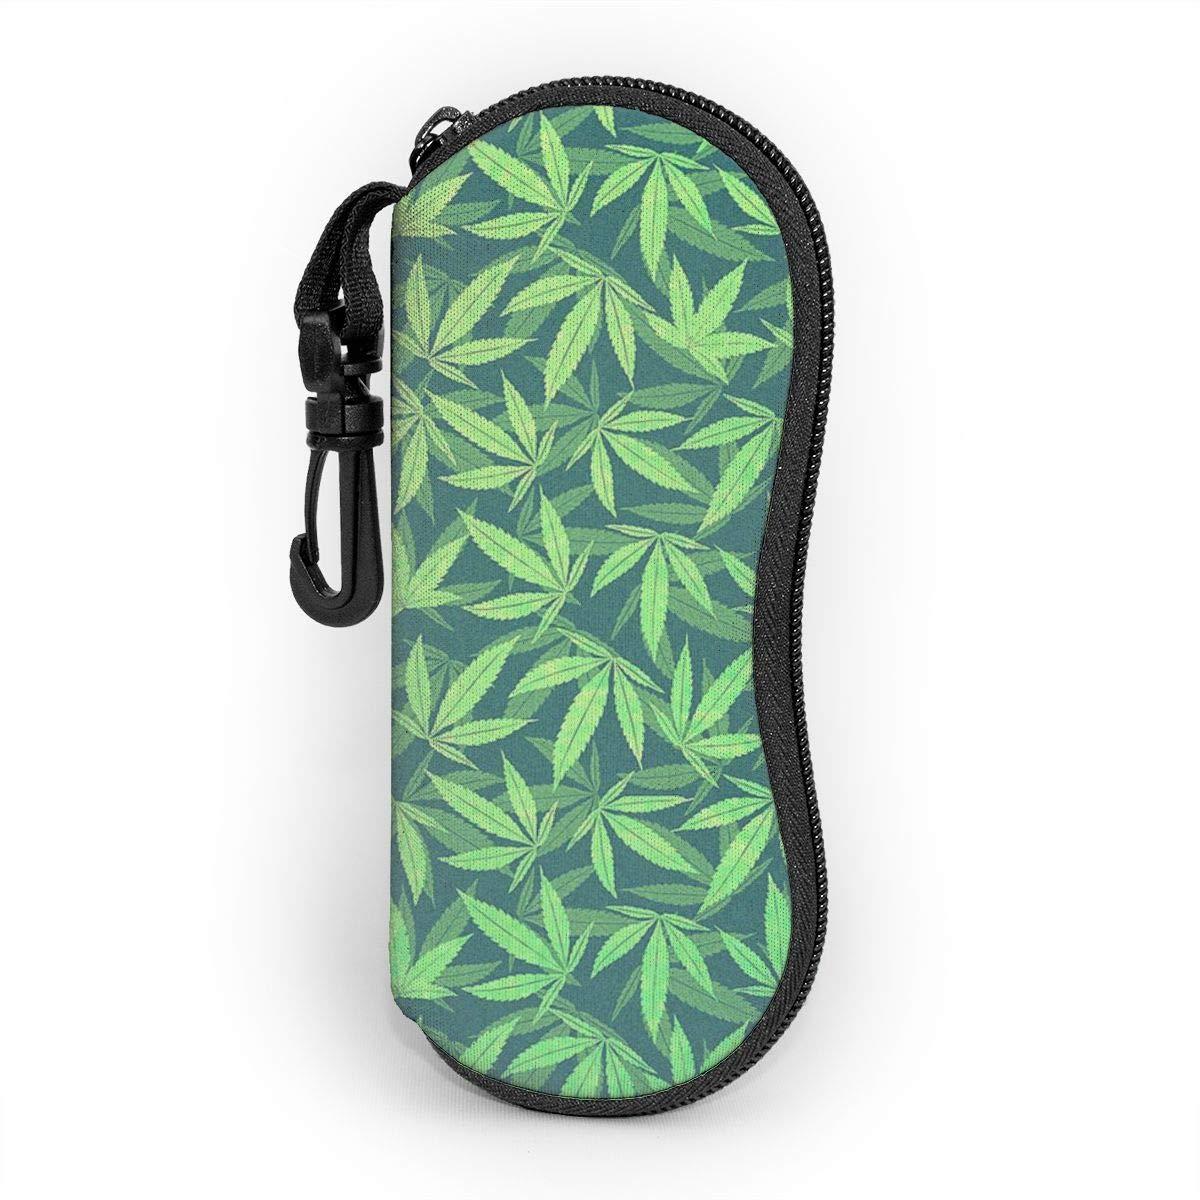 -cannabis-hemp-420-marijuana-pattern-philipp-rietz (1) Sunglasses Soft Case Ultra Light Neoprene Zipper Glasses Case With Belt Clip